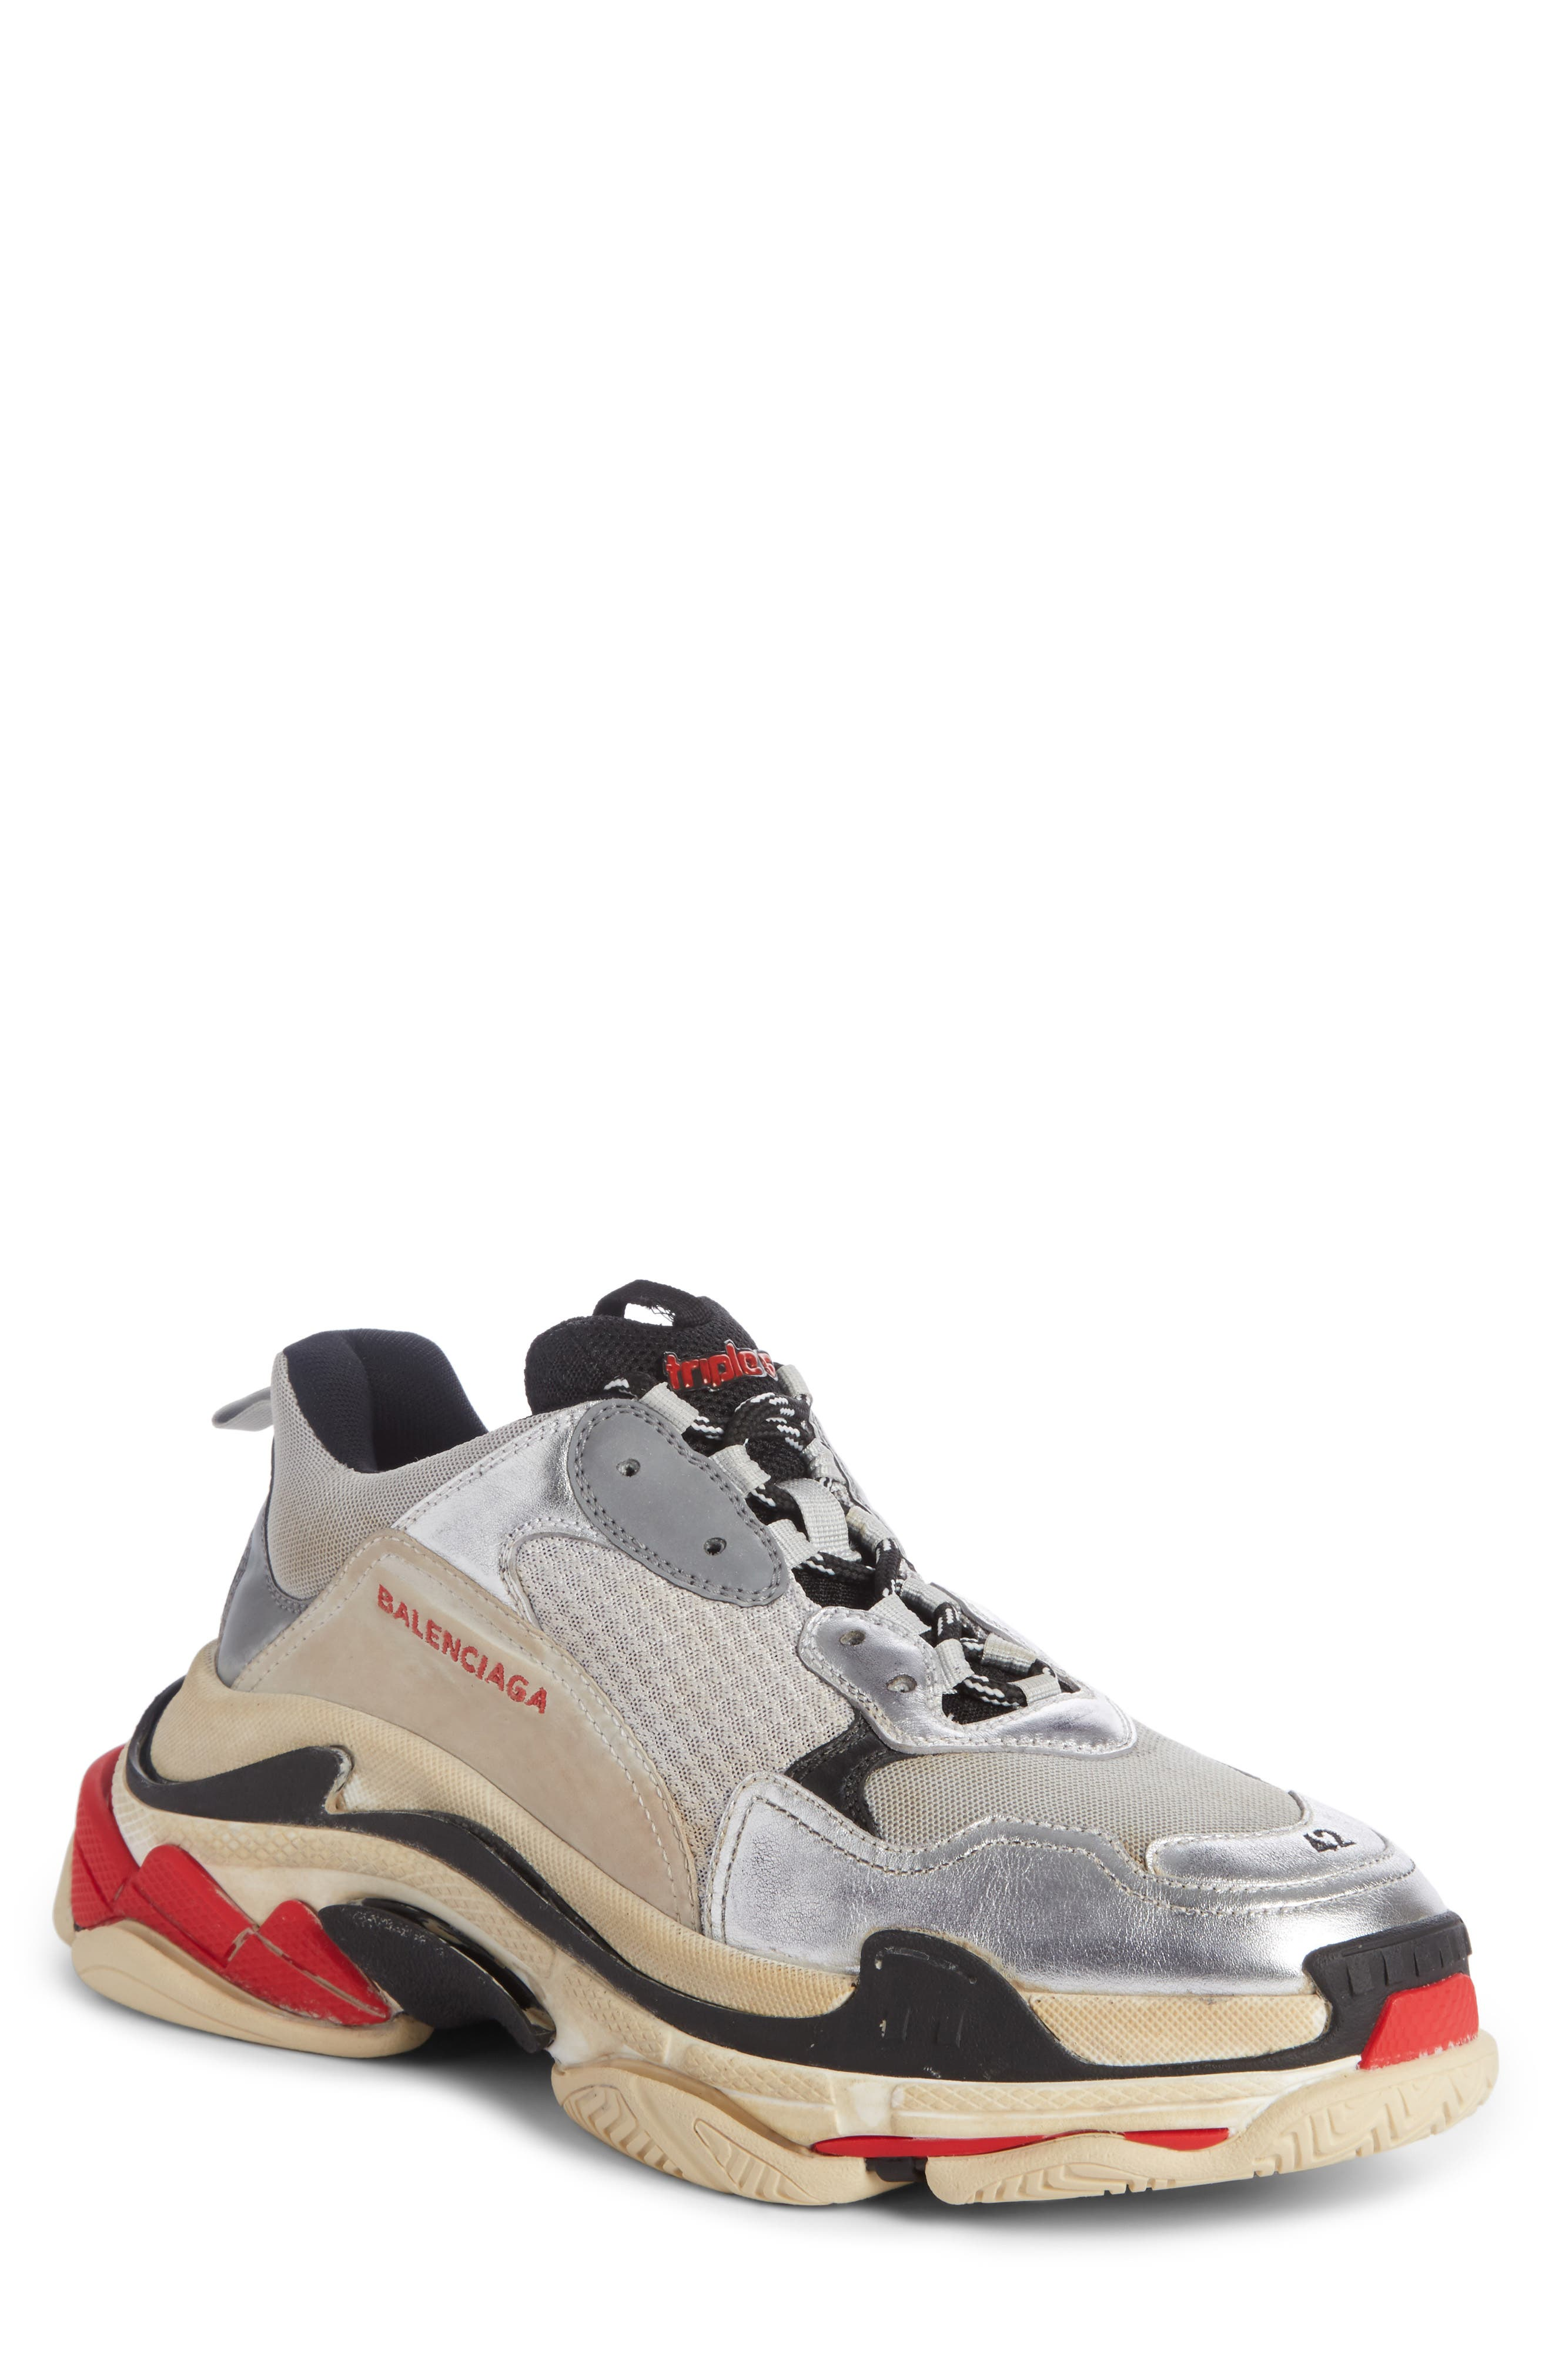 Main Image - Balenciaga Triple S Retro Sneaker (Men)